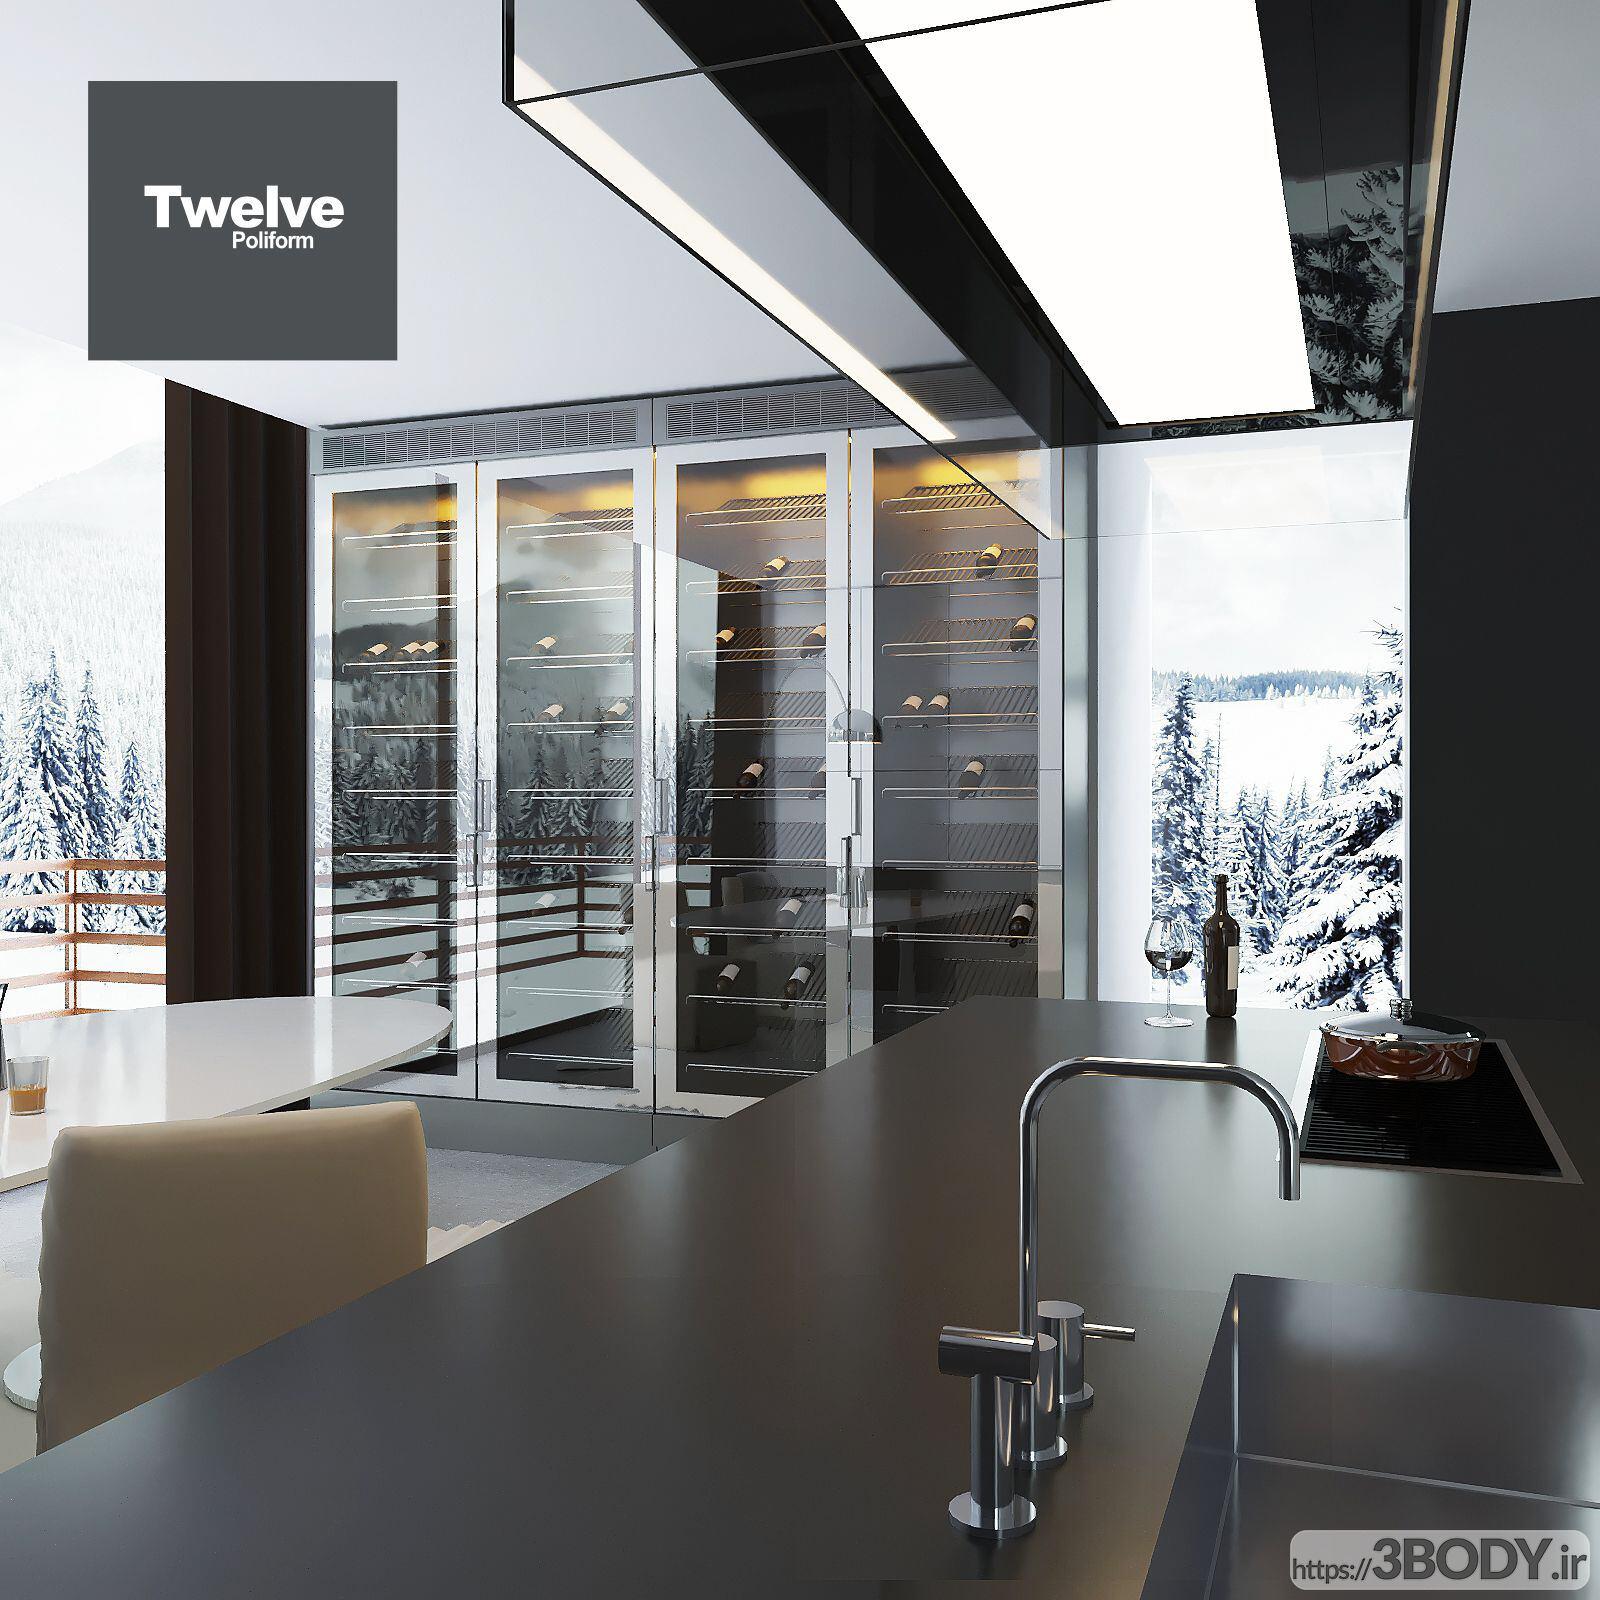 مدل سه بعدی دکوراسیون آشپزخانه عکس 2